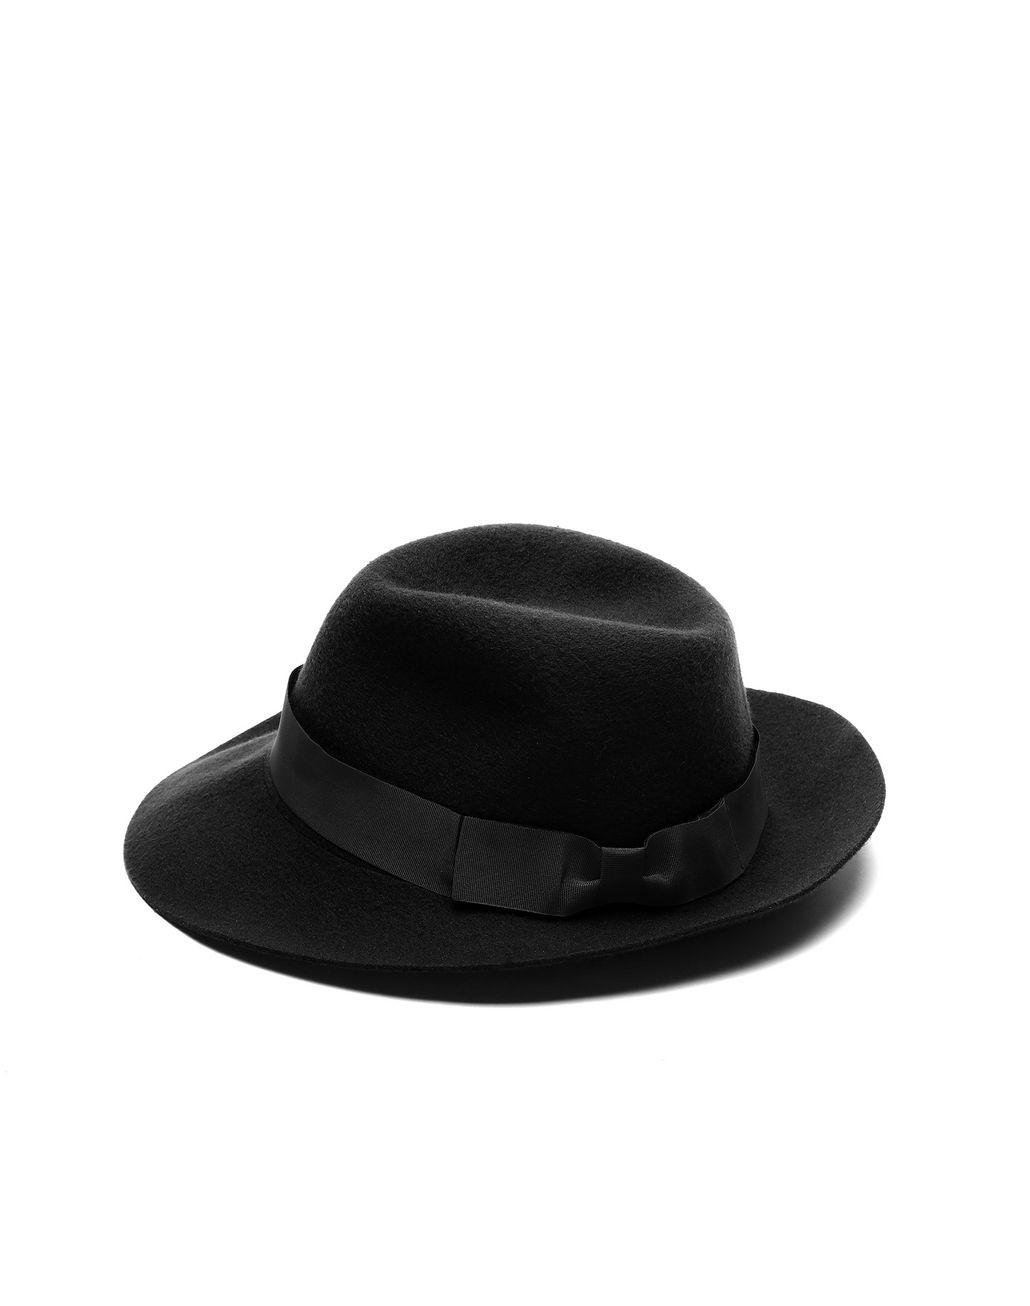 BRIONI Black Foldable Fedora Hats   Gloves       pickupInStoreShippingNotGuaranteed info      b9b9d130212